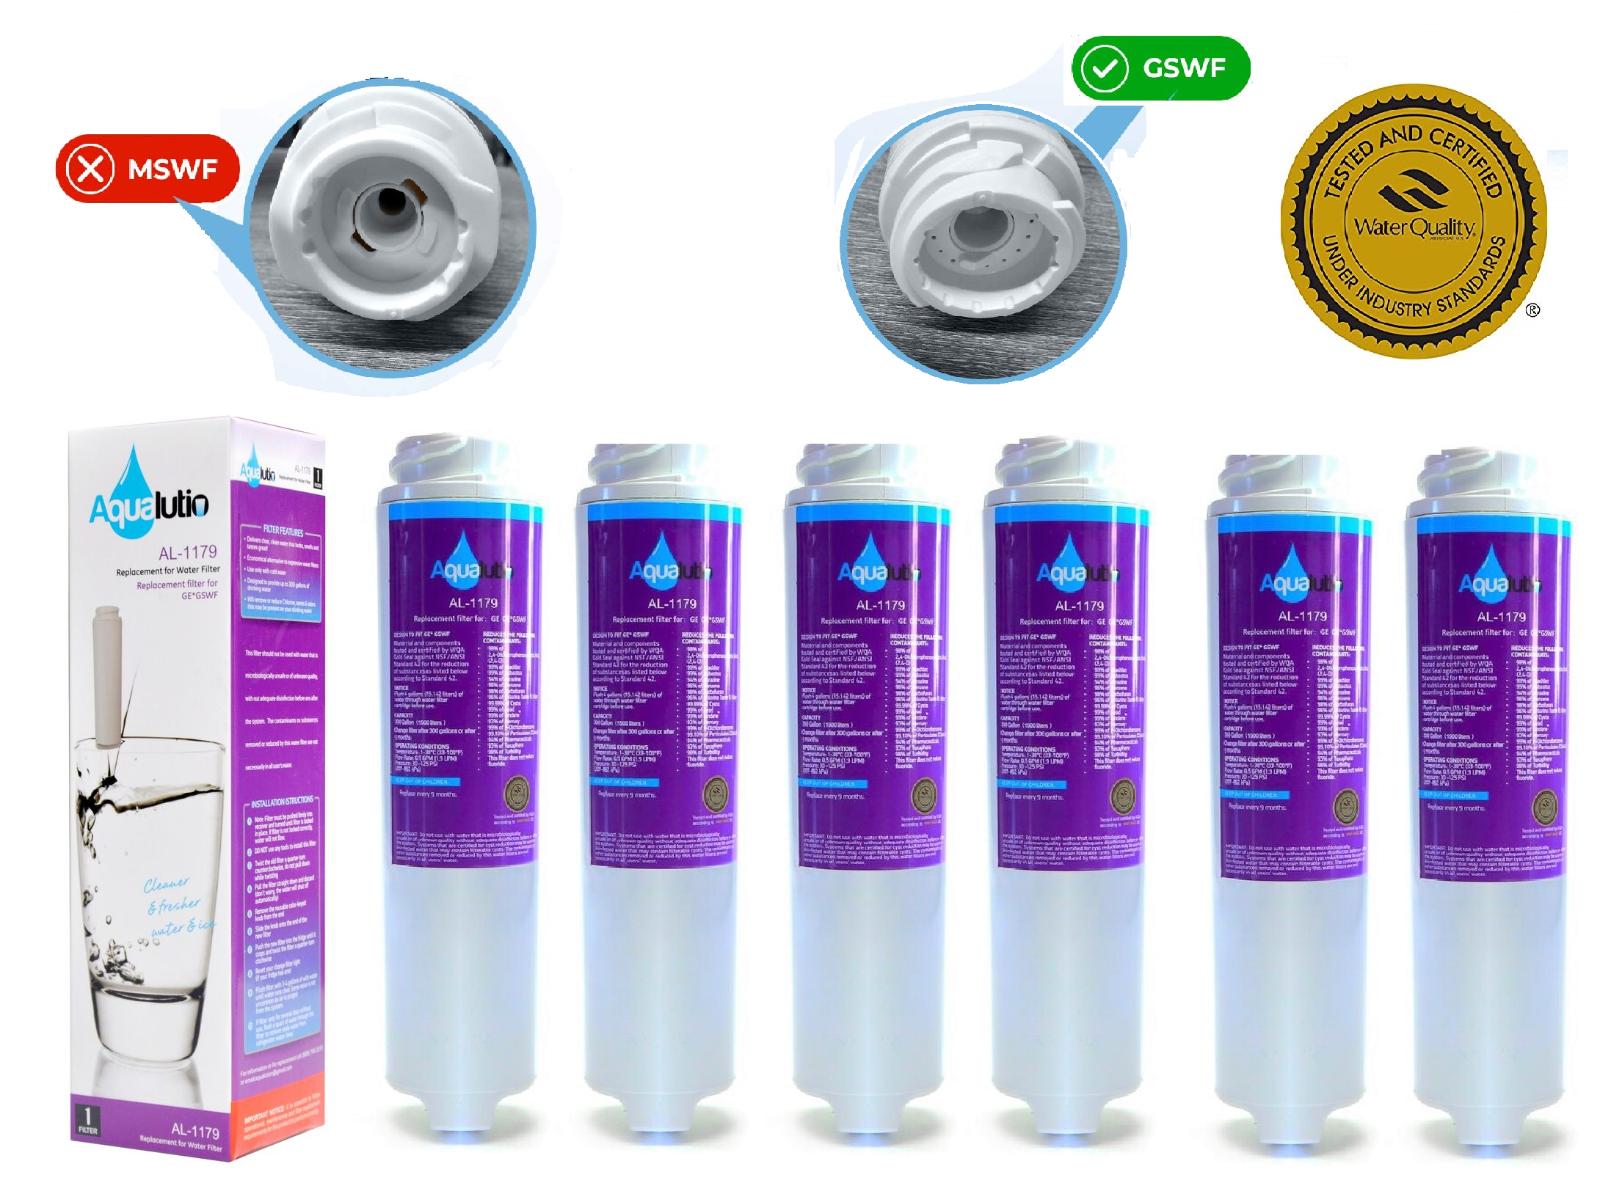 GE SmartWater Refrigerator Water Filter